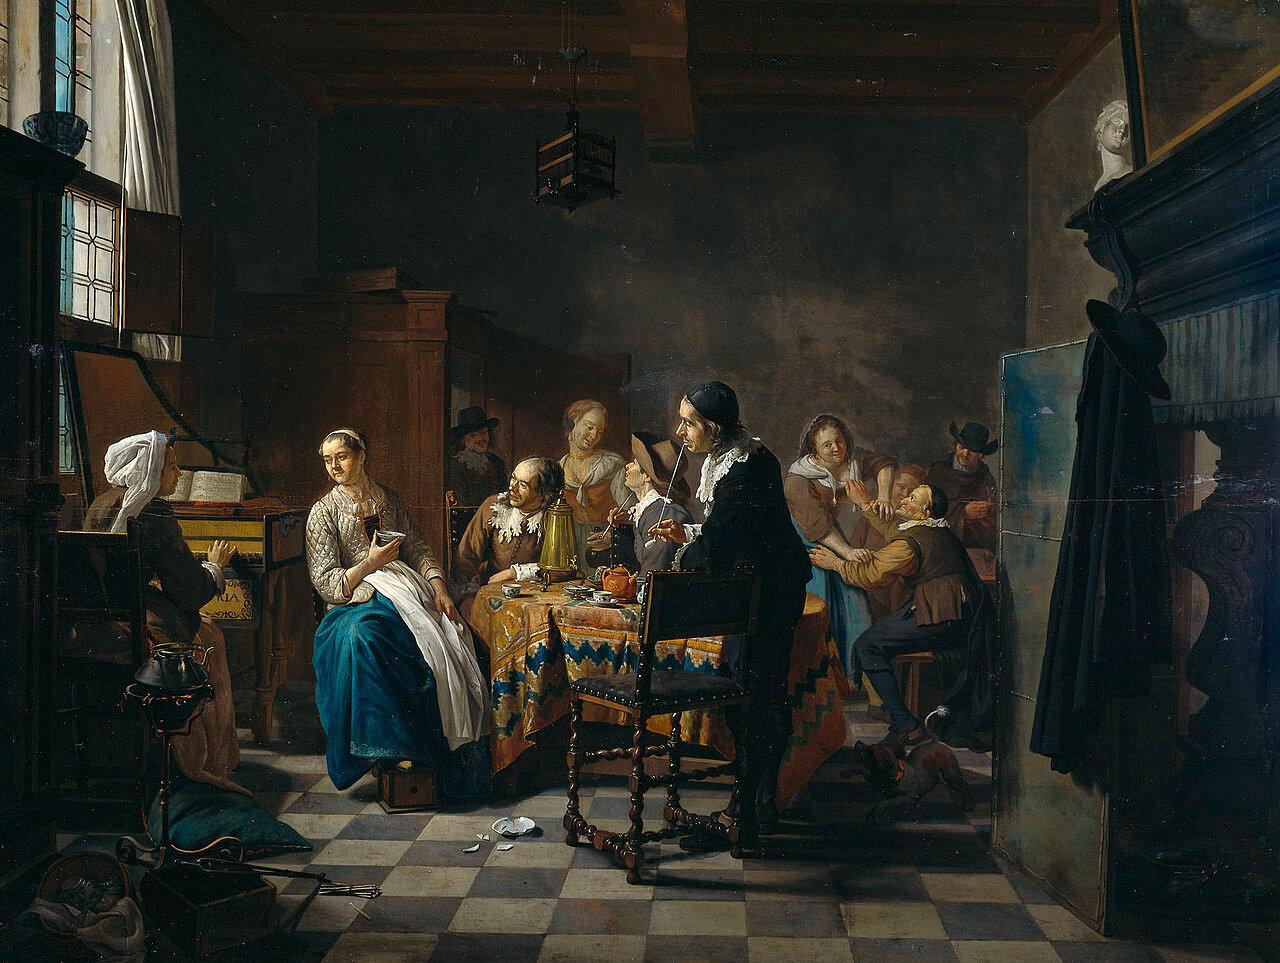 'Het_nieuwe_lied'_Rijksmuseum_SK-A-1614_jpeg.jpeg